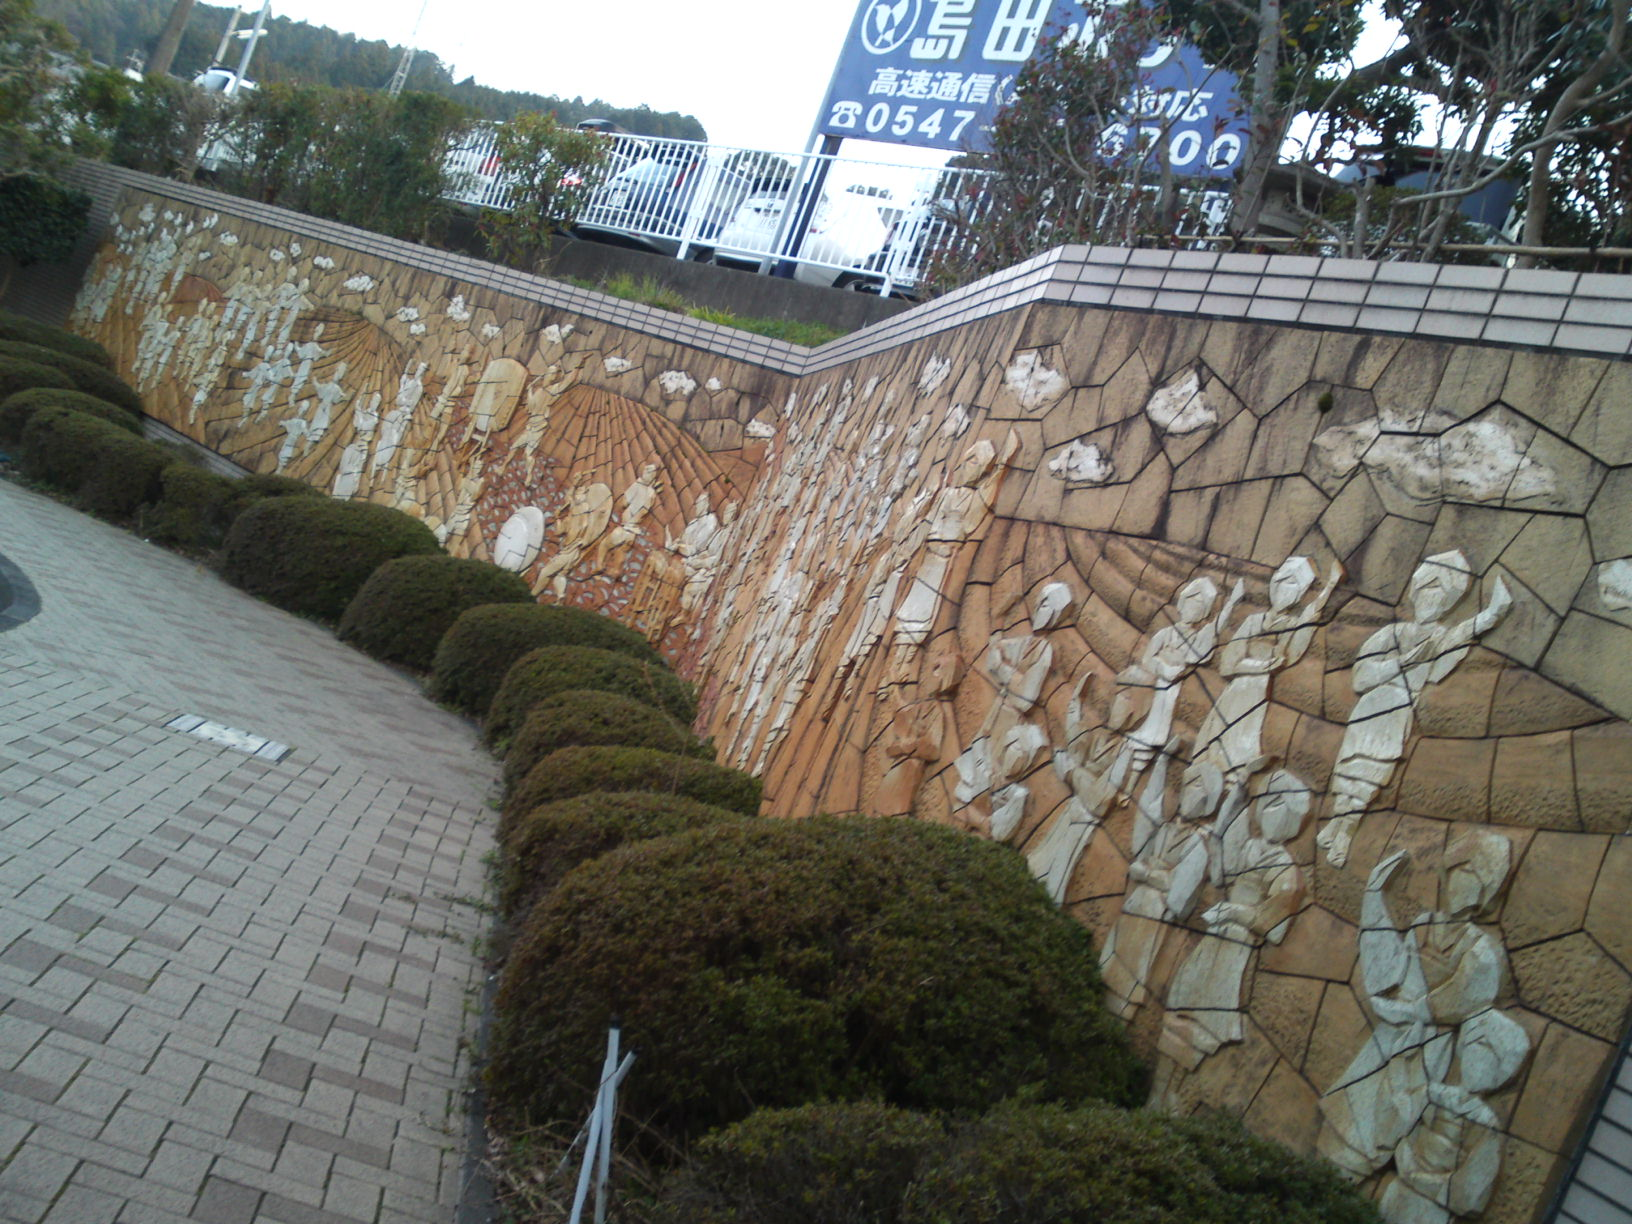 shizuoka men Shop shizuoka graffiti sleeveless shirt created by xtreme_line personalize it with photos & text or purchase as is.